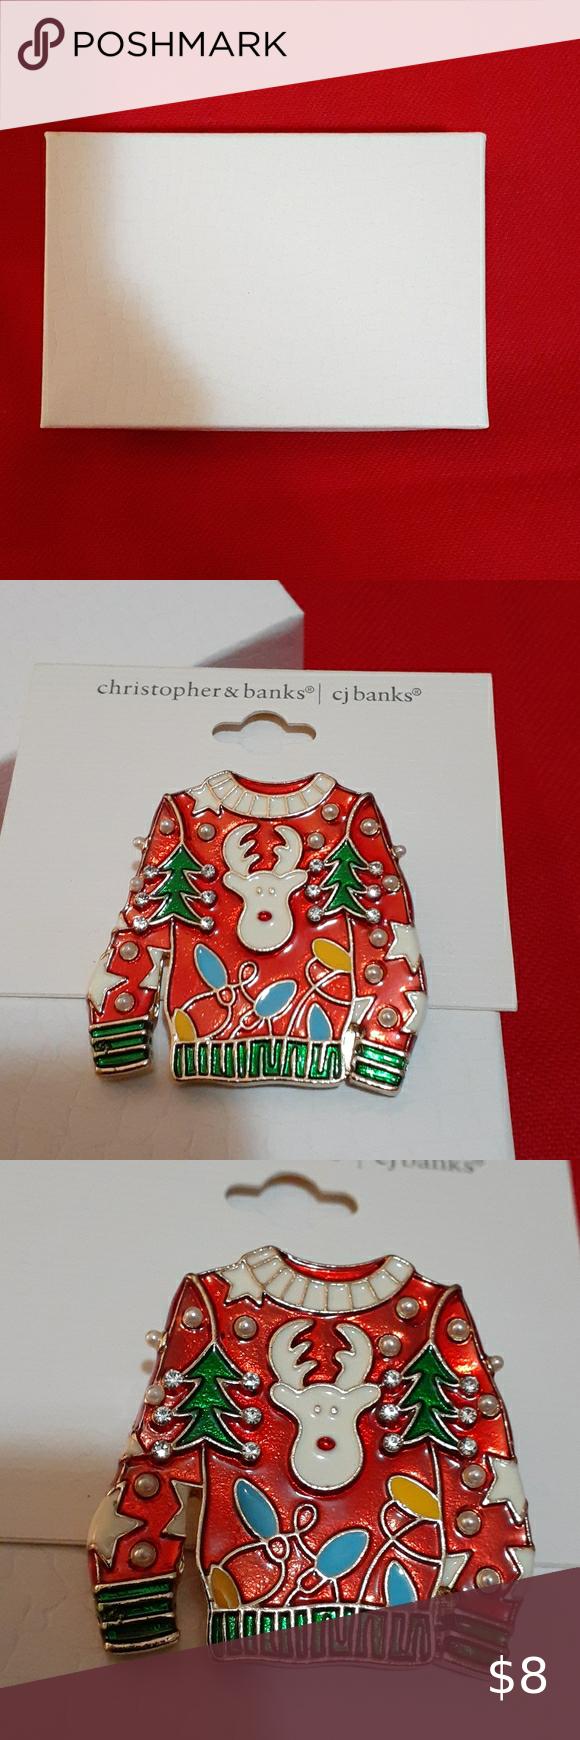 CHRISTOPHER & BANKS JEWELRY LADIES CHRISTMAS SWEATER BROOCHE Christopher & Banks Jewelry Brooches